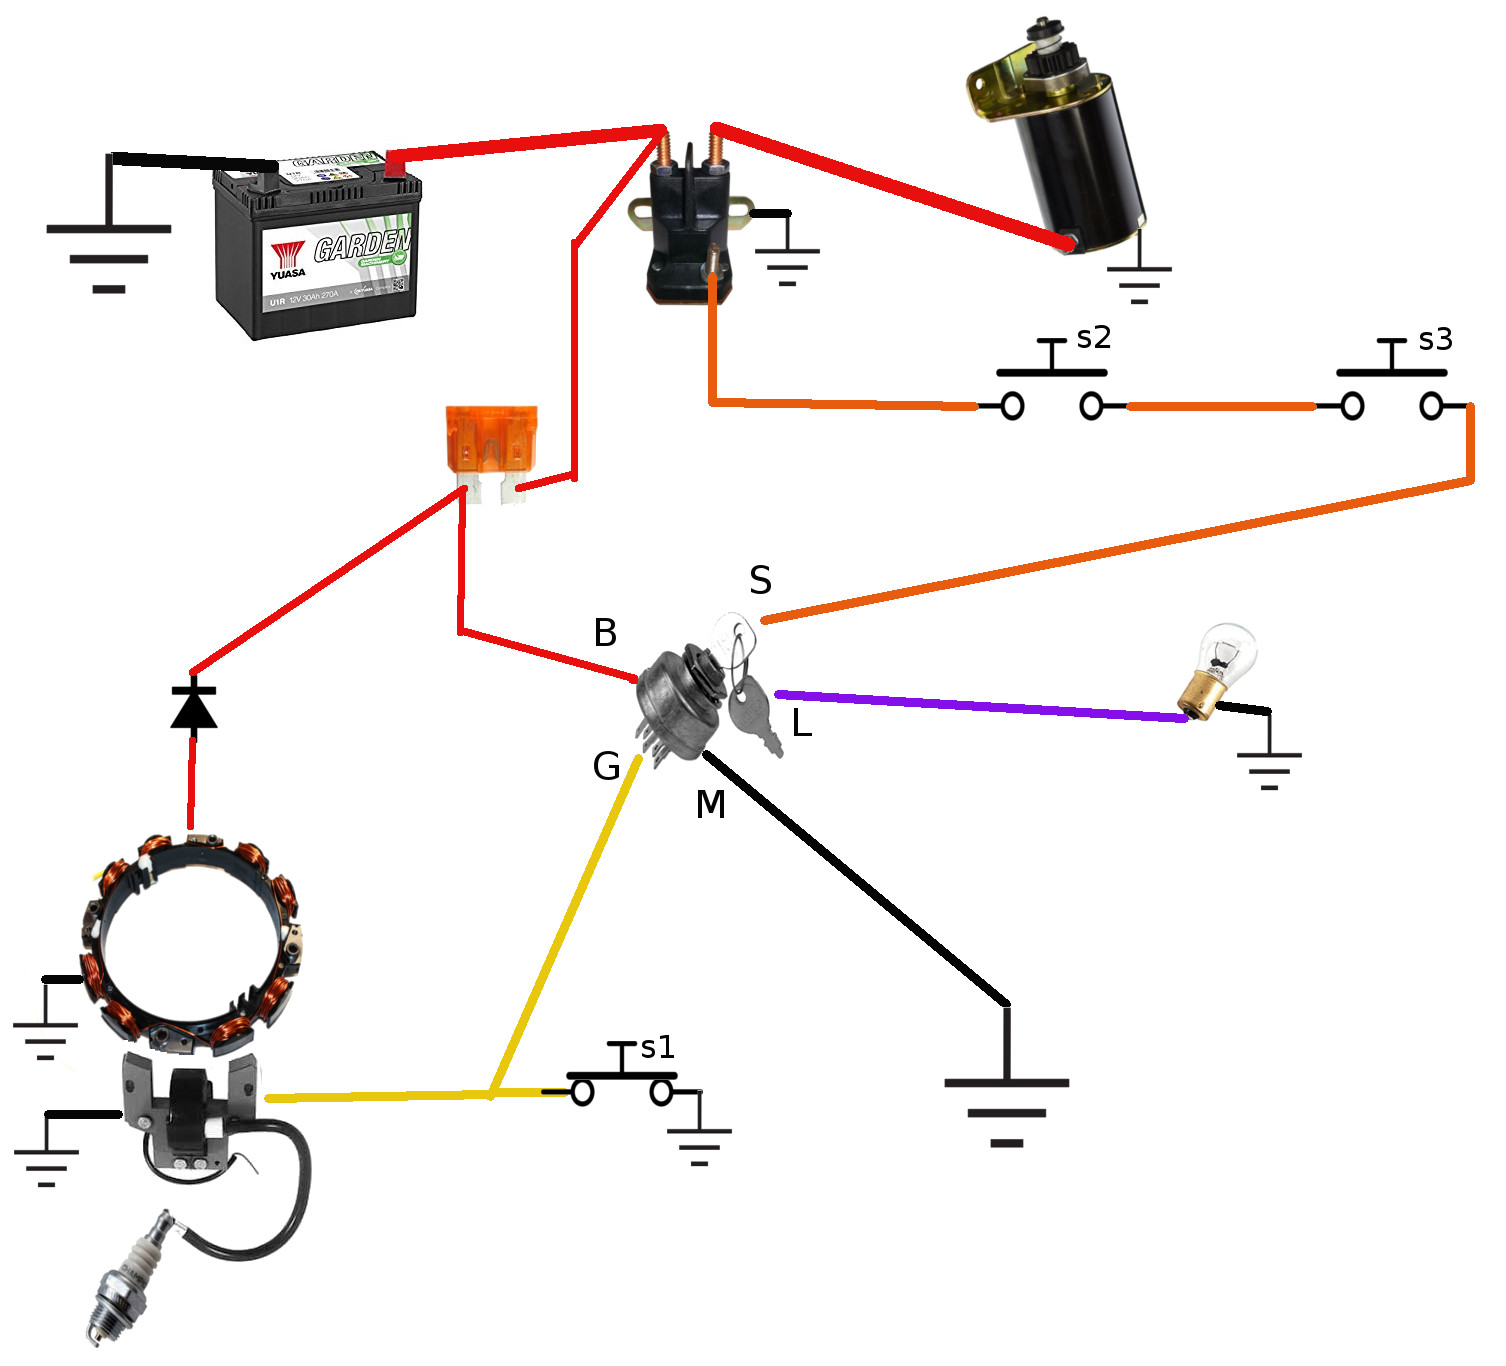 Schema electrique d'un micro onde